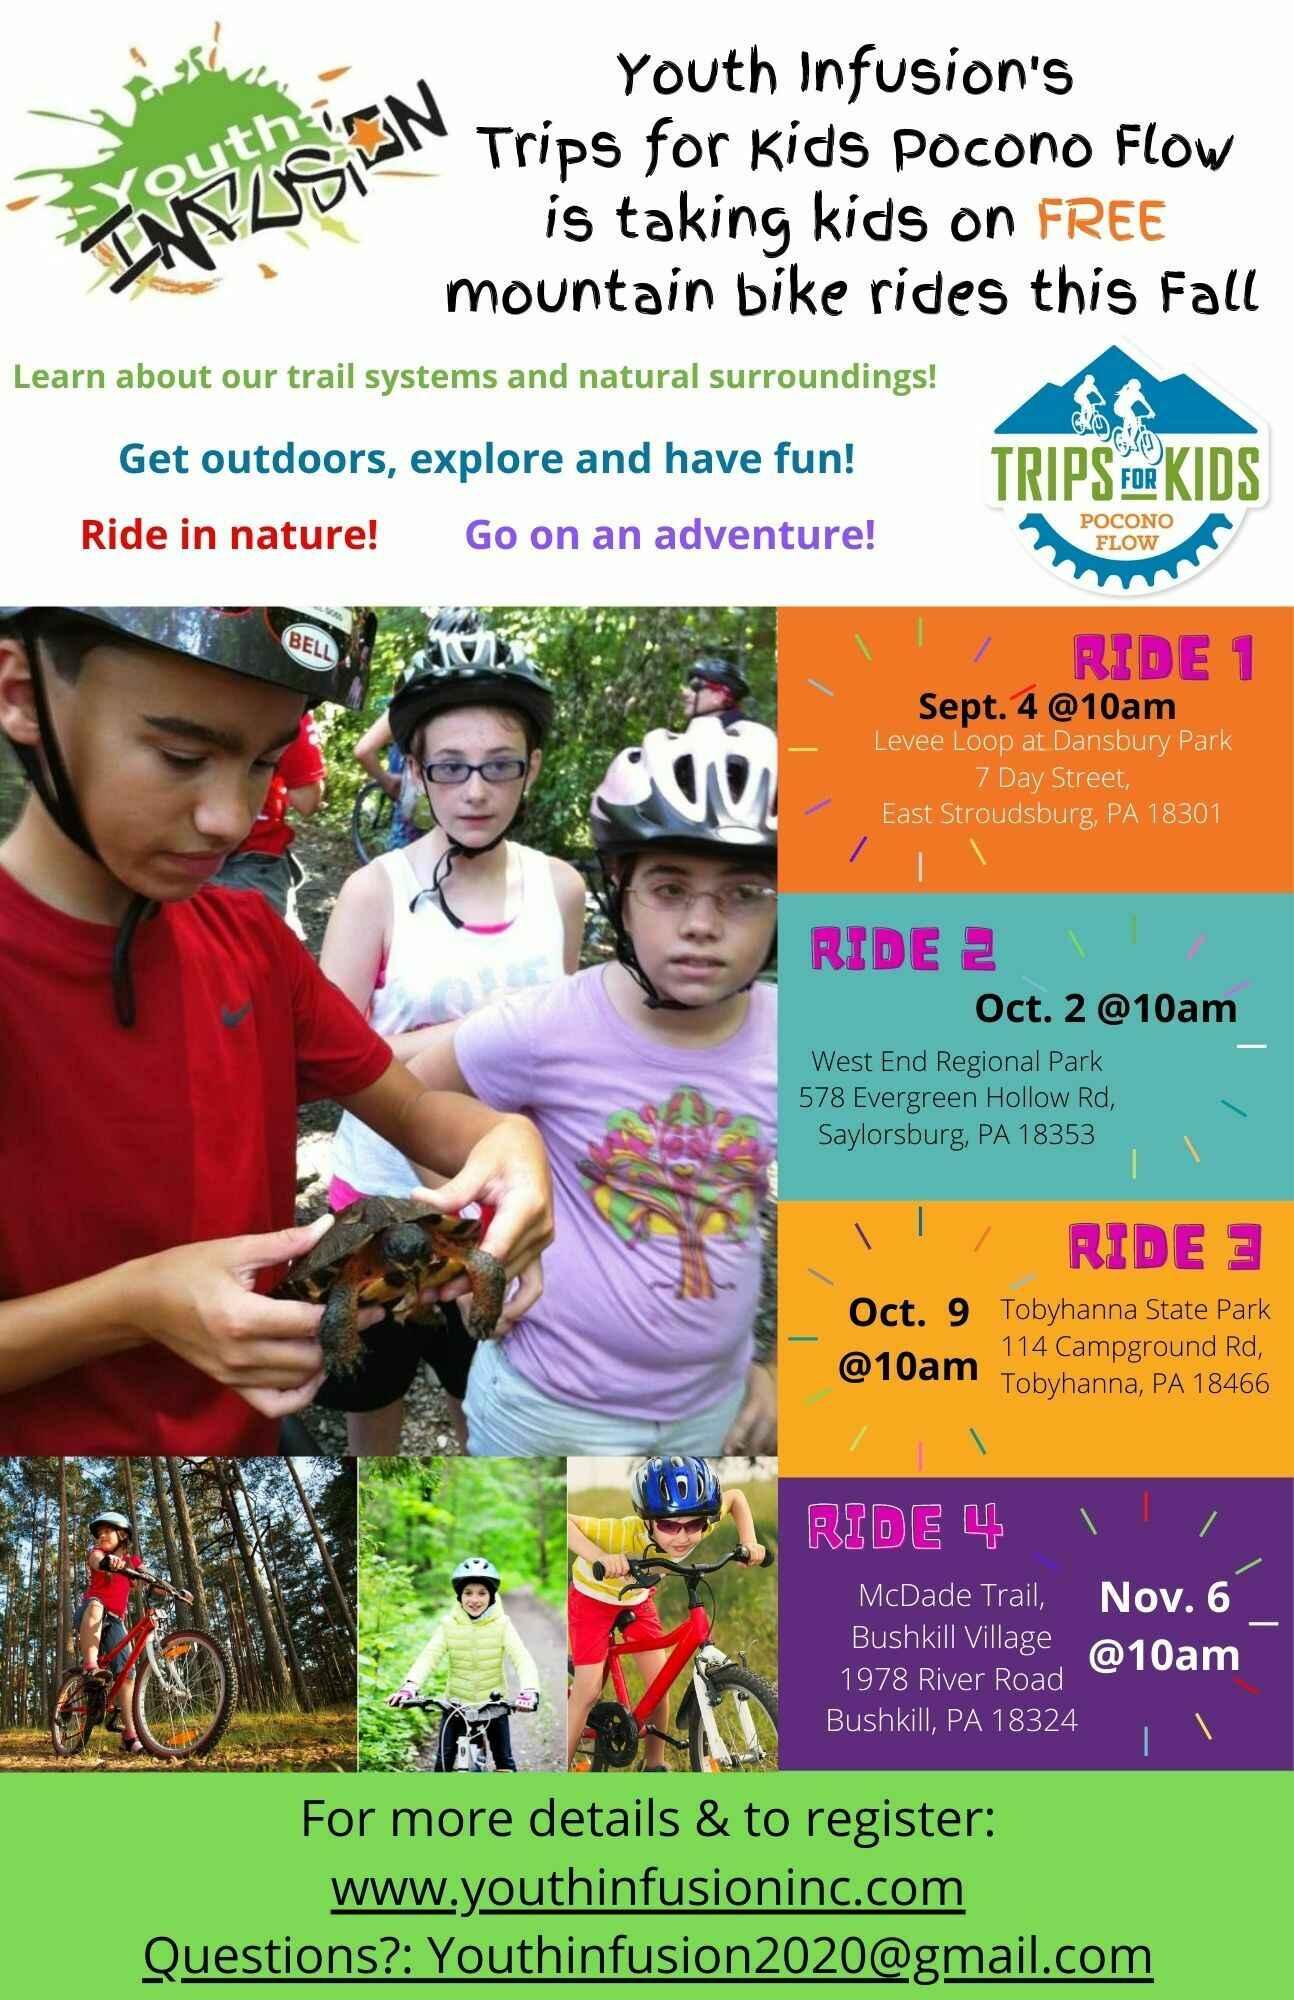 TAKE A KID MOUNTAIN BIKING DAY - FREE Trips for Kids Pocono Flow Trail Ride - Saturday, October 2, 2021 image